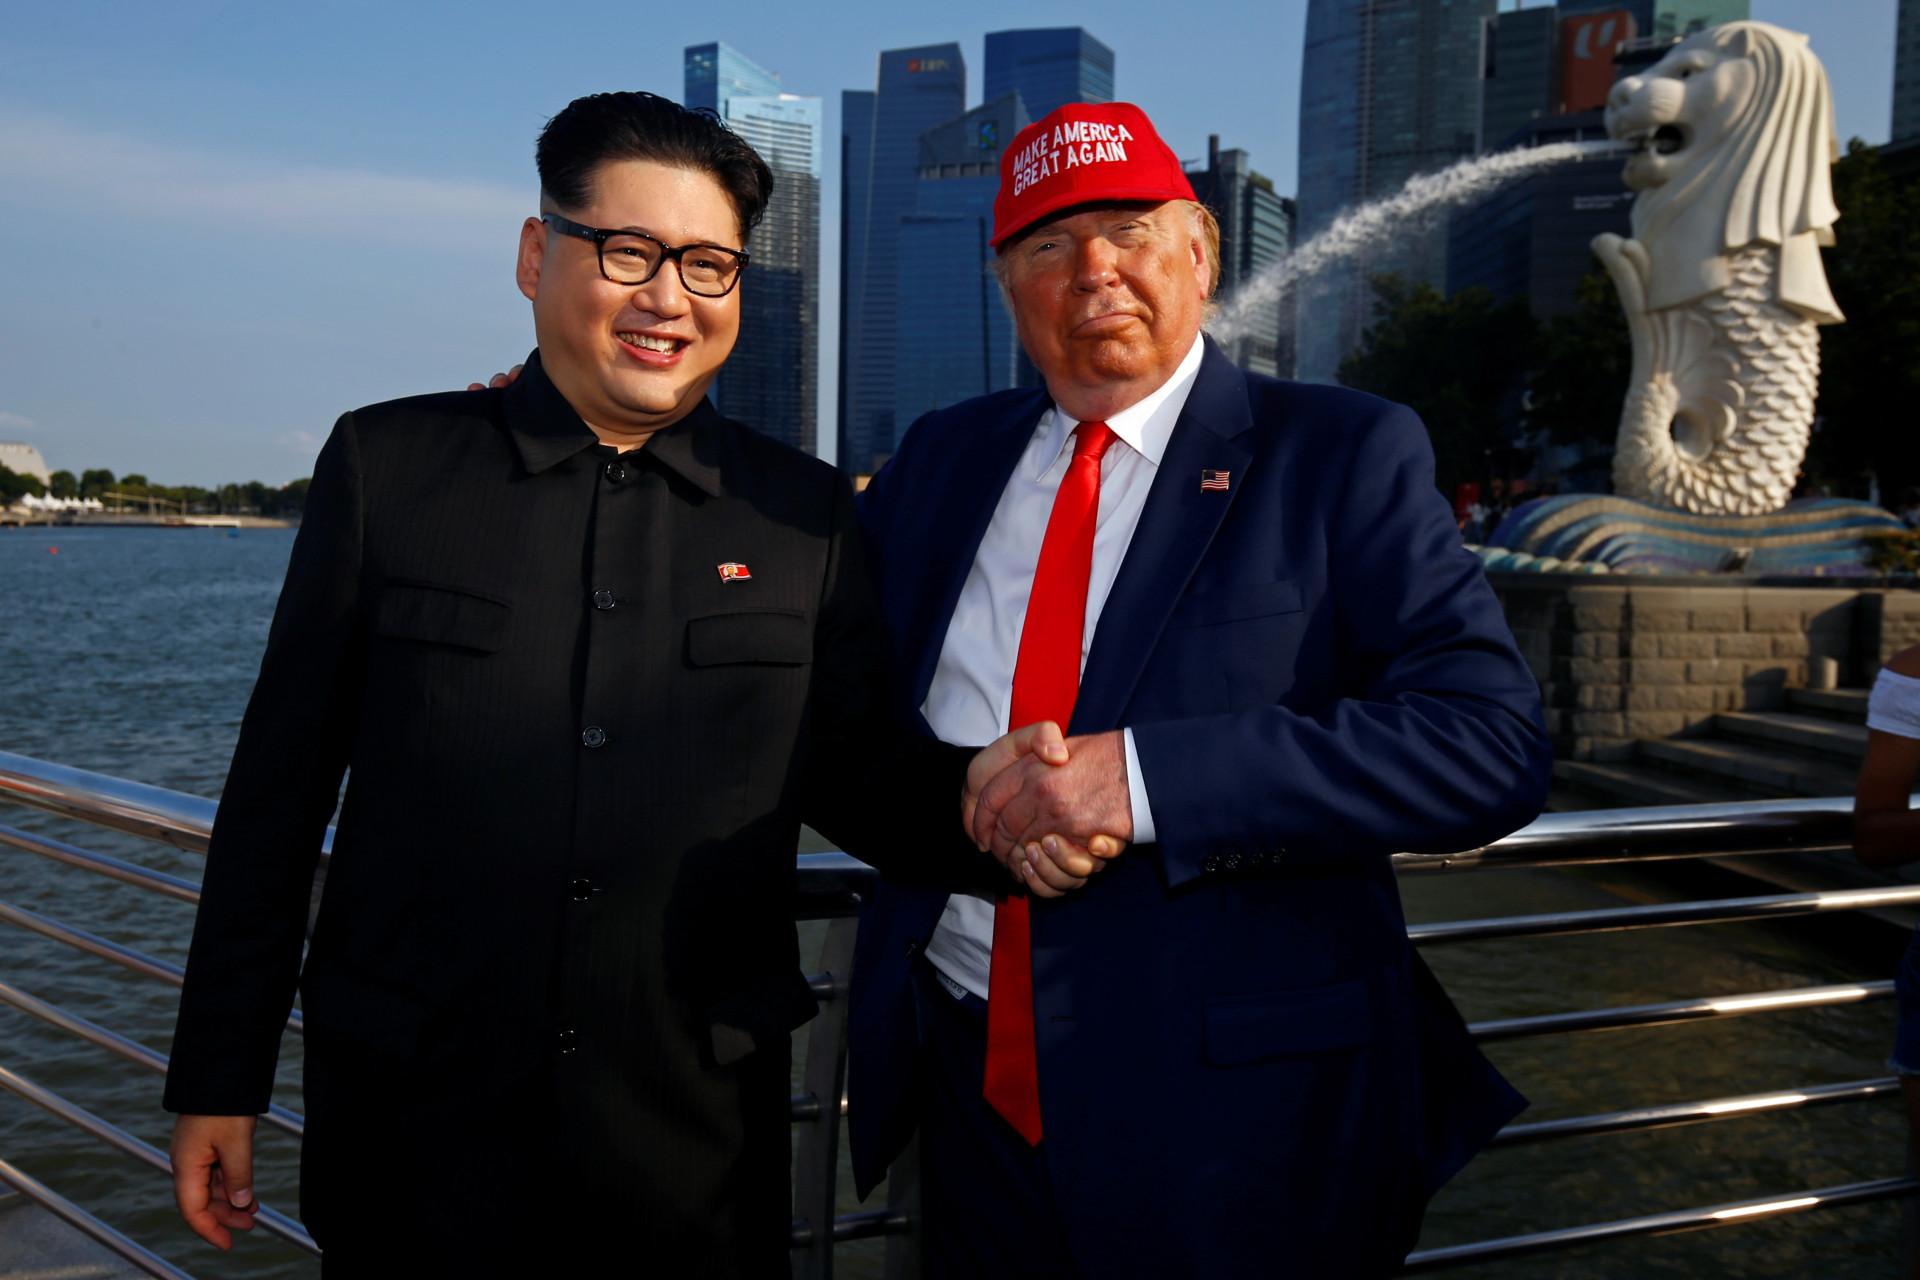 Sósias de Trump e Kim Jong-un surpreendem populares em Singapura